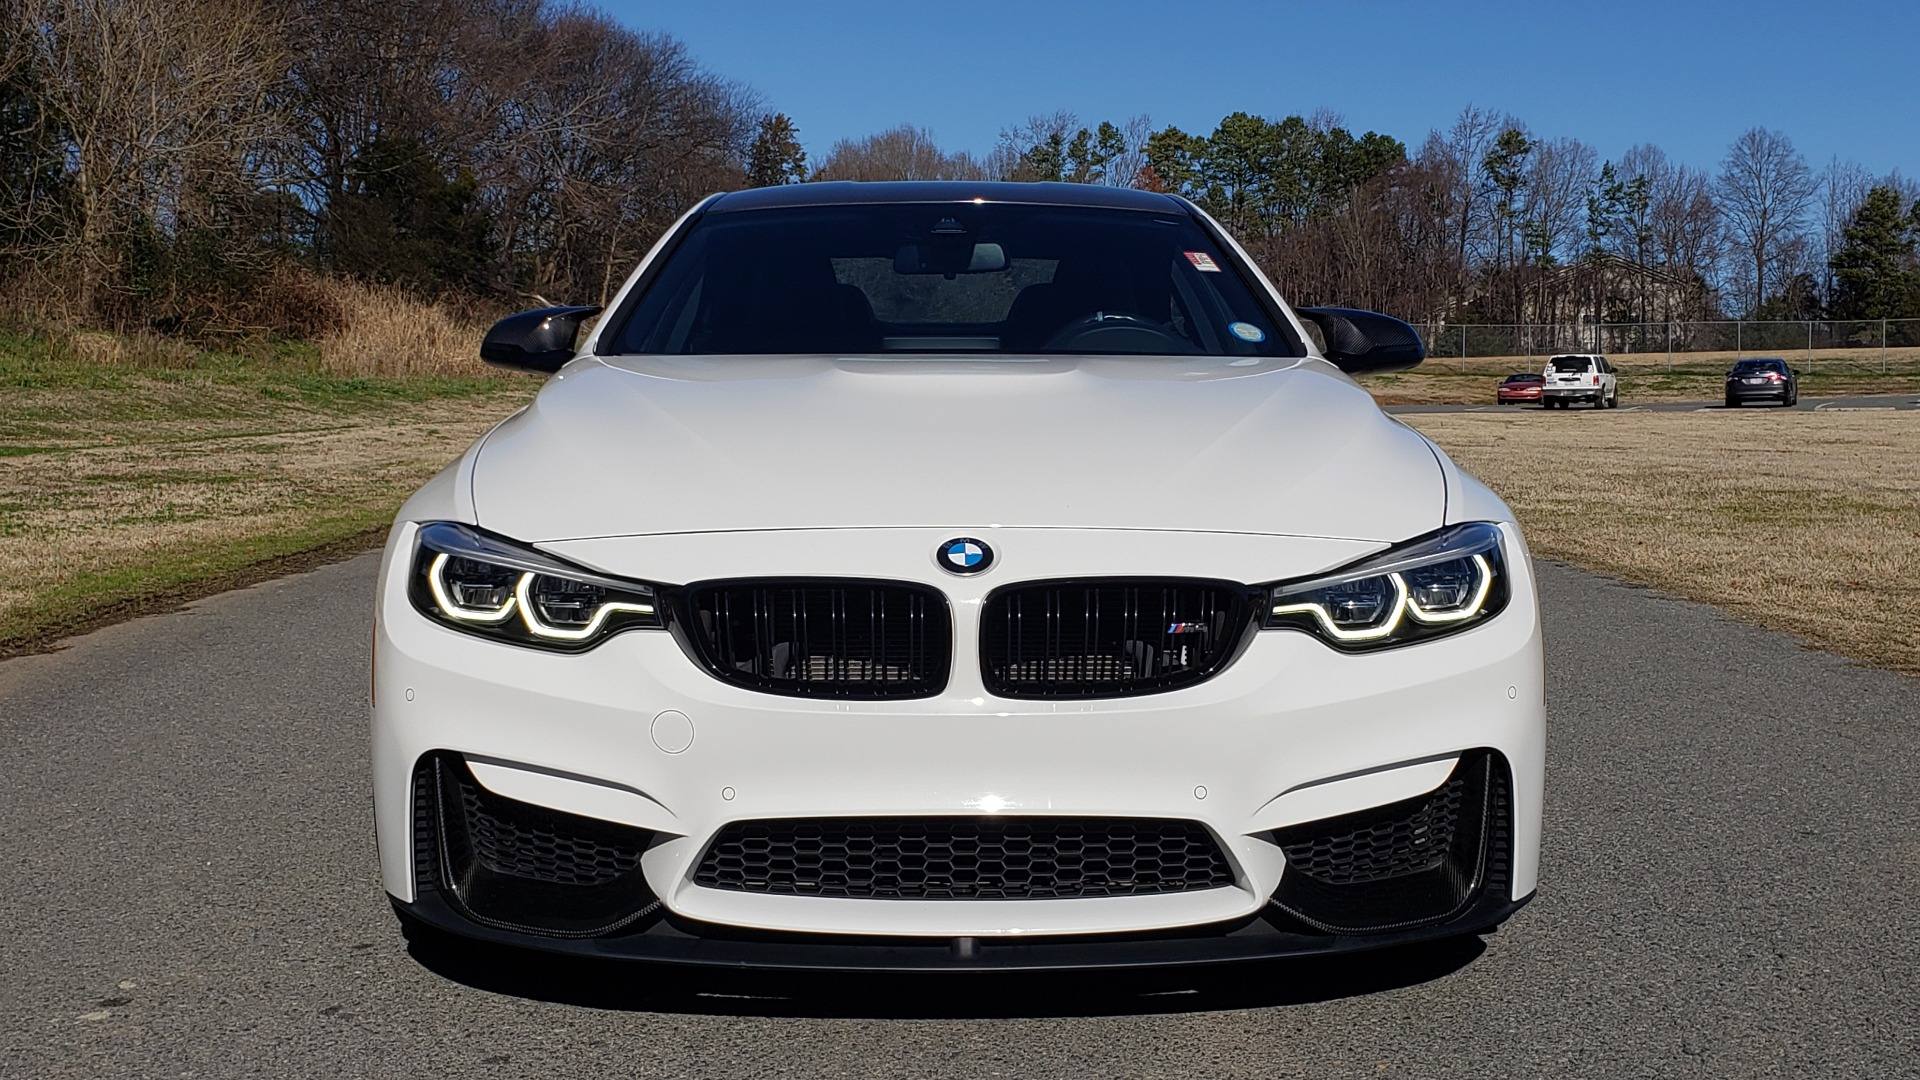 Used 2018 BMW M4 COMP PKG / EXEC / M-DRIVER / PARK CNTRL / ACTIVE BLIND SPOT for sale Sold at Formula Imports in Charlotte NC 28227 12